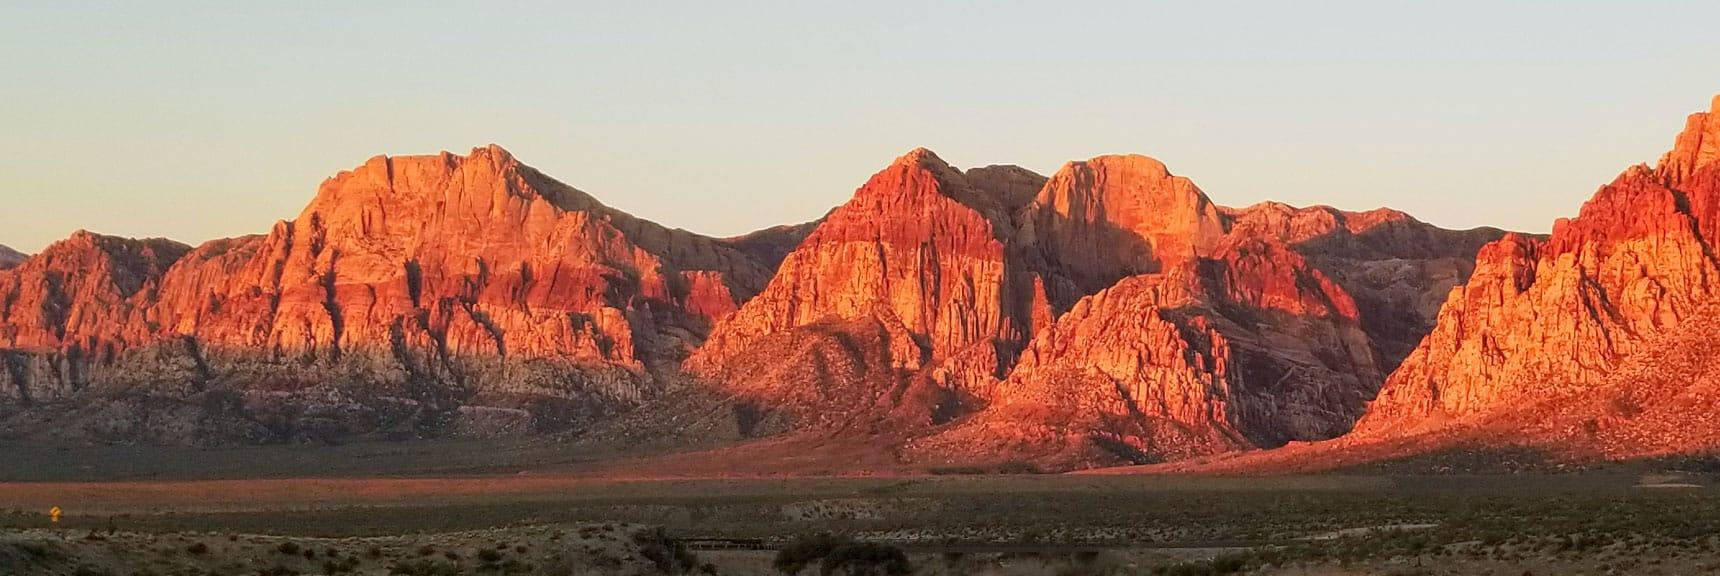 Rainbow Mountain Sunrise in Red Rock National Park, Nevada